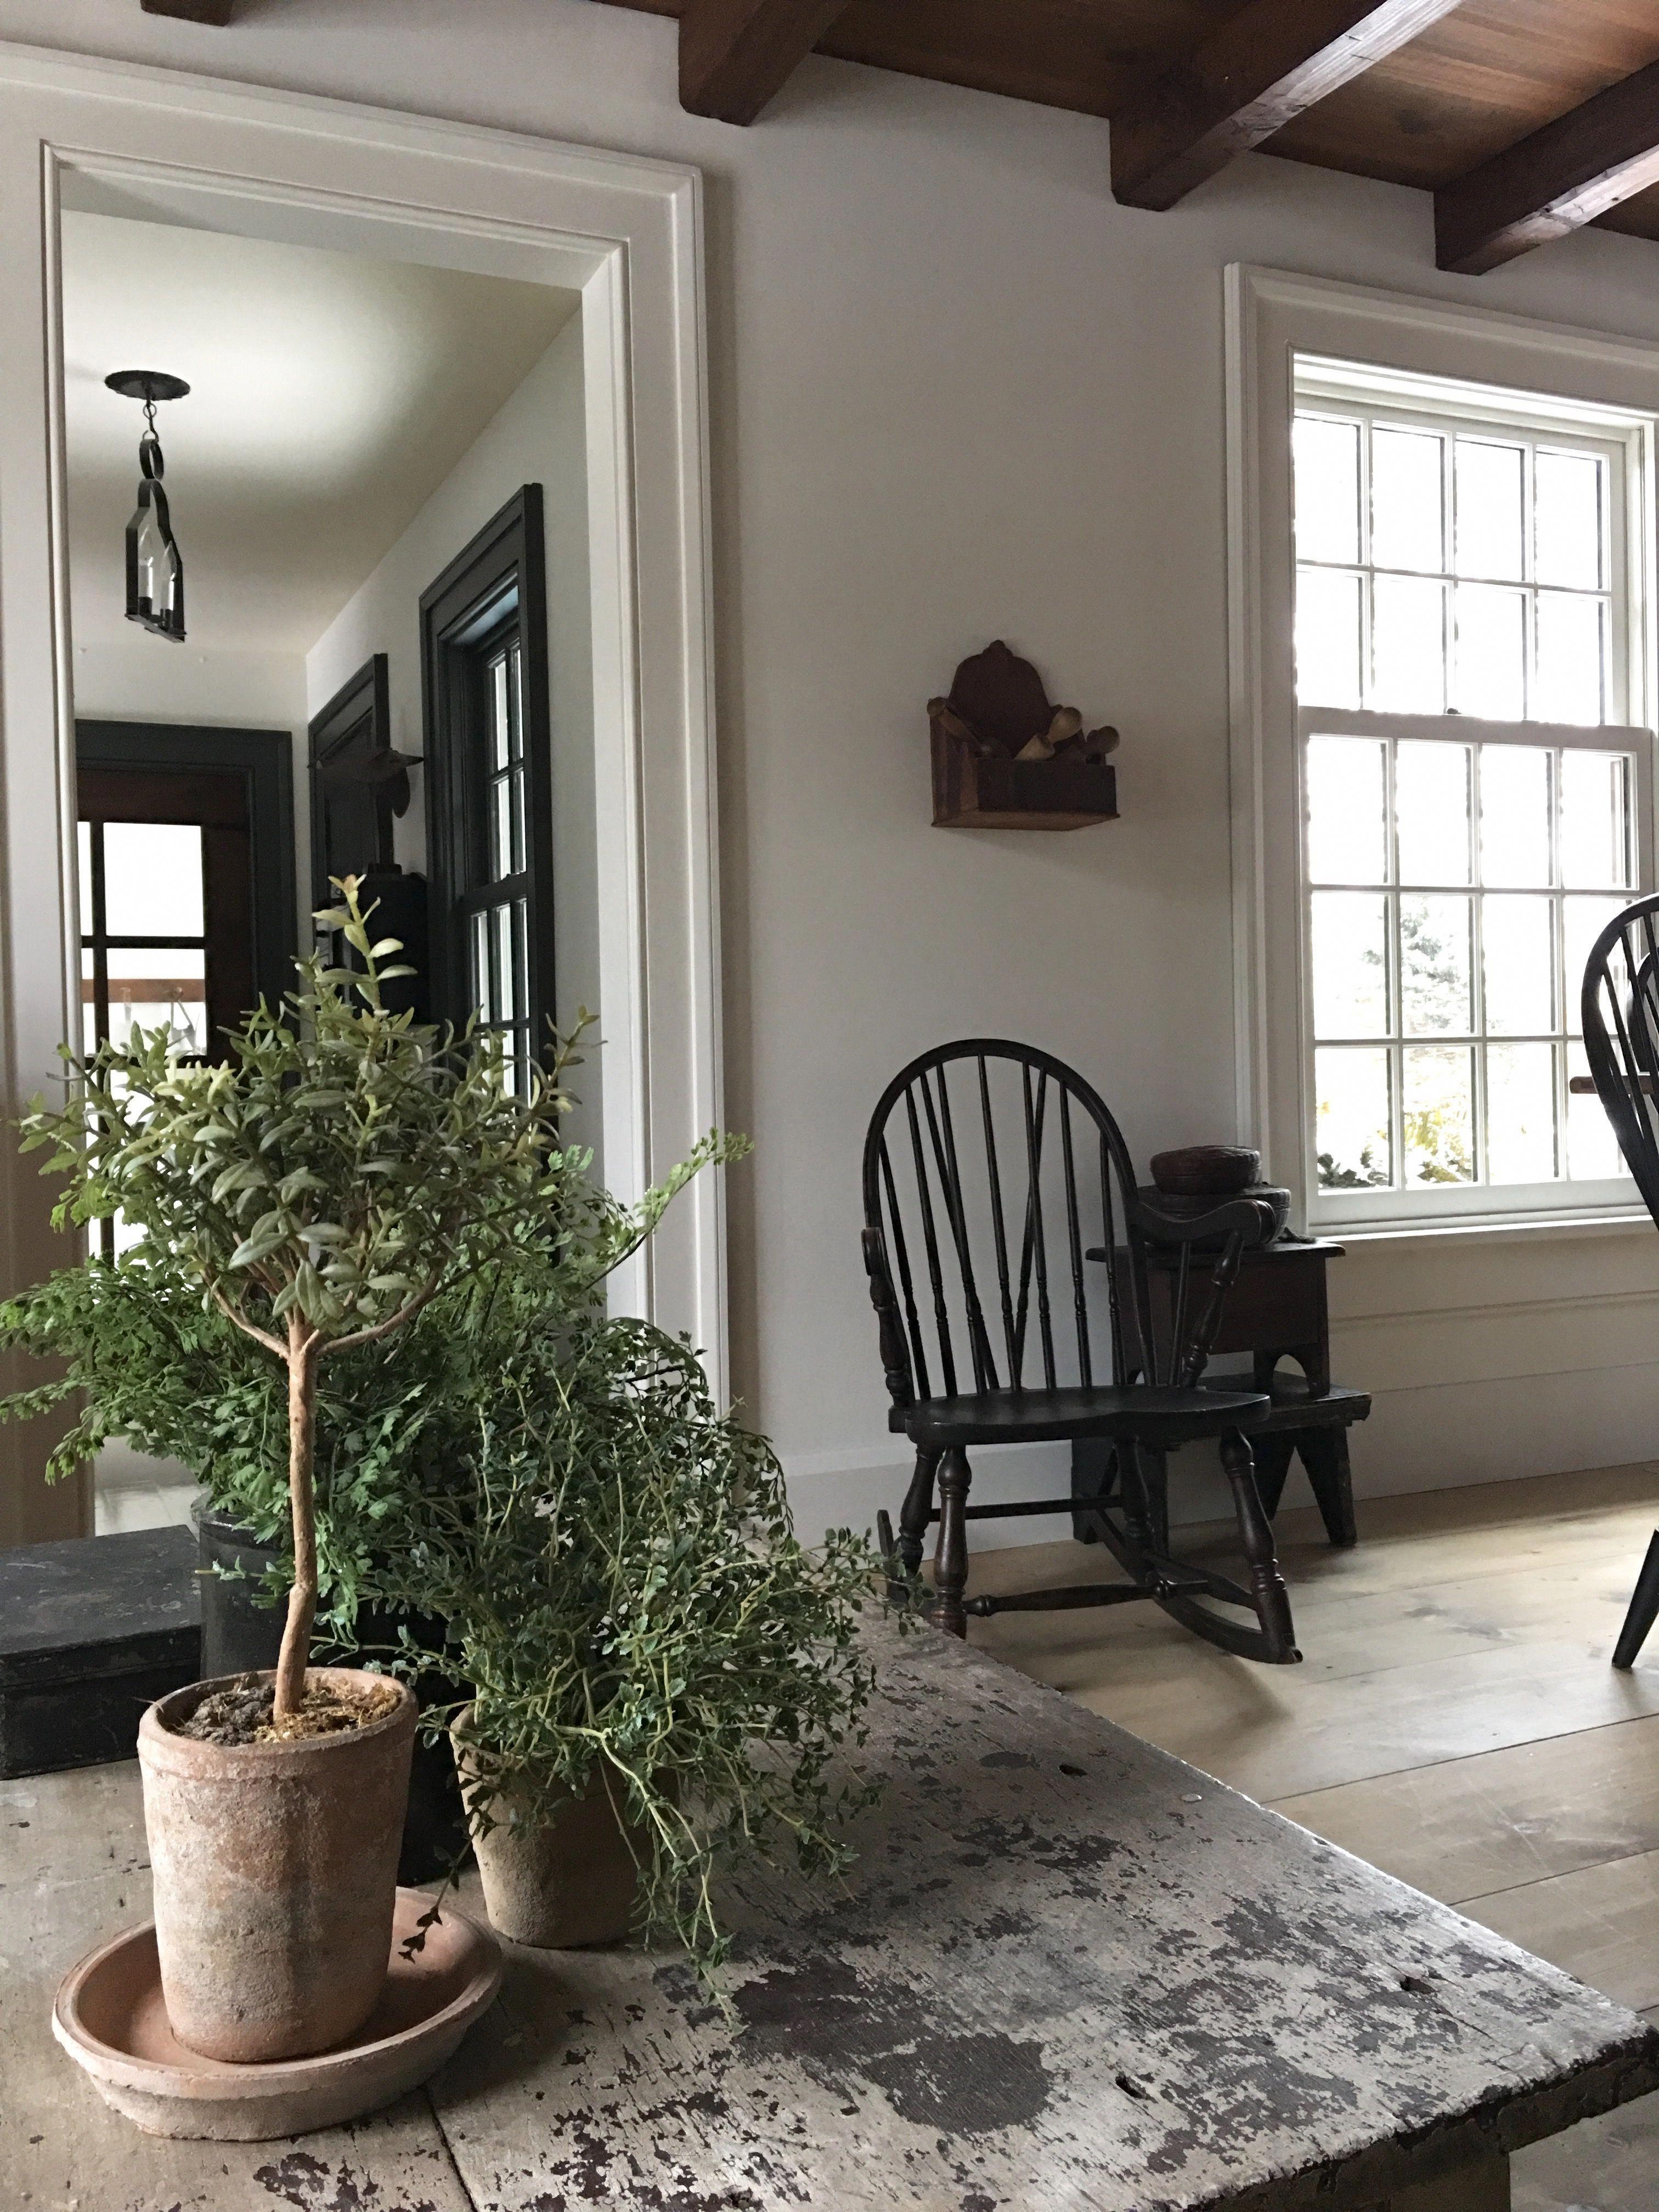 Primitive Home Crossword Clue Primitivehomes Primitive Homes Home Decor Home Decor Inspiration